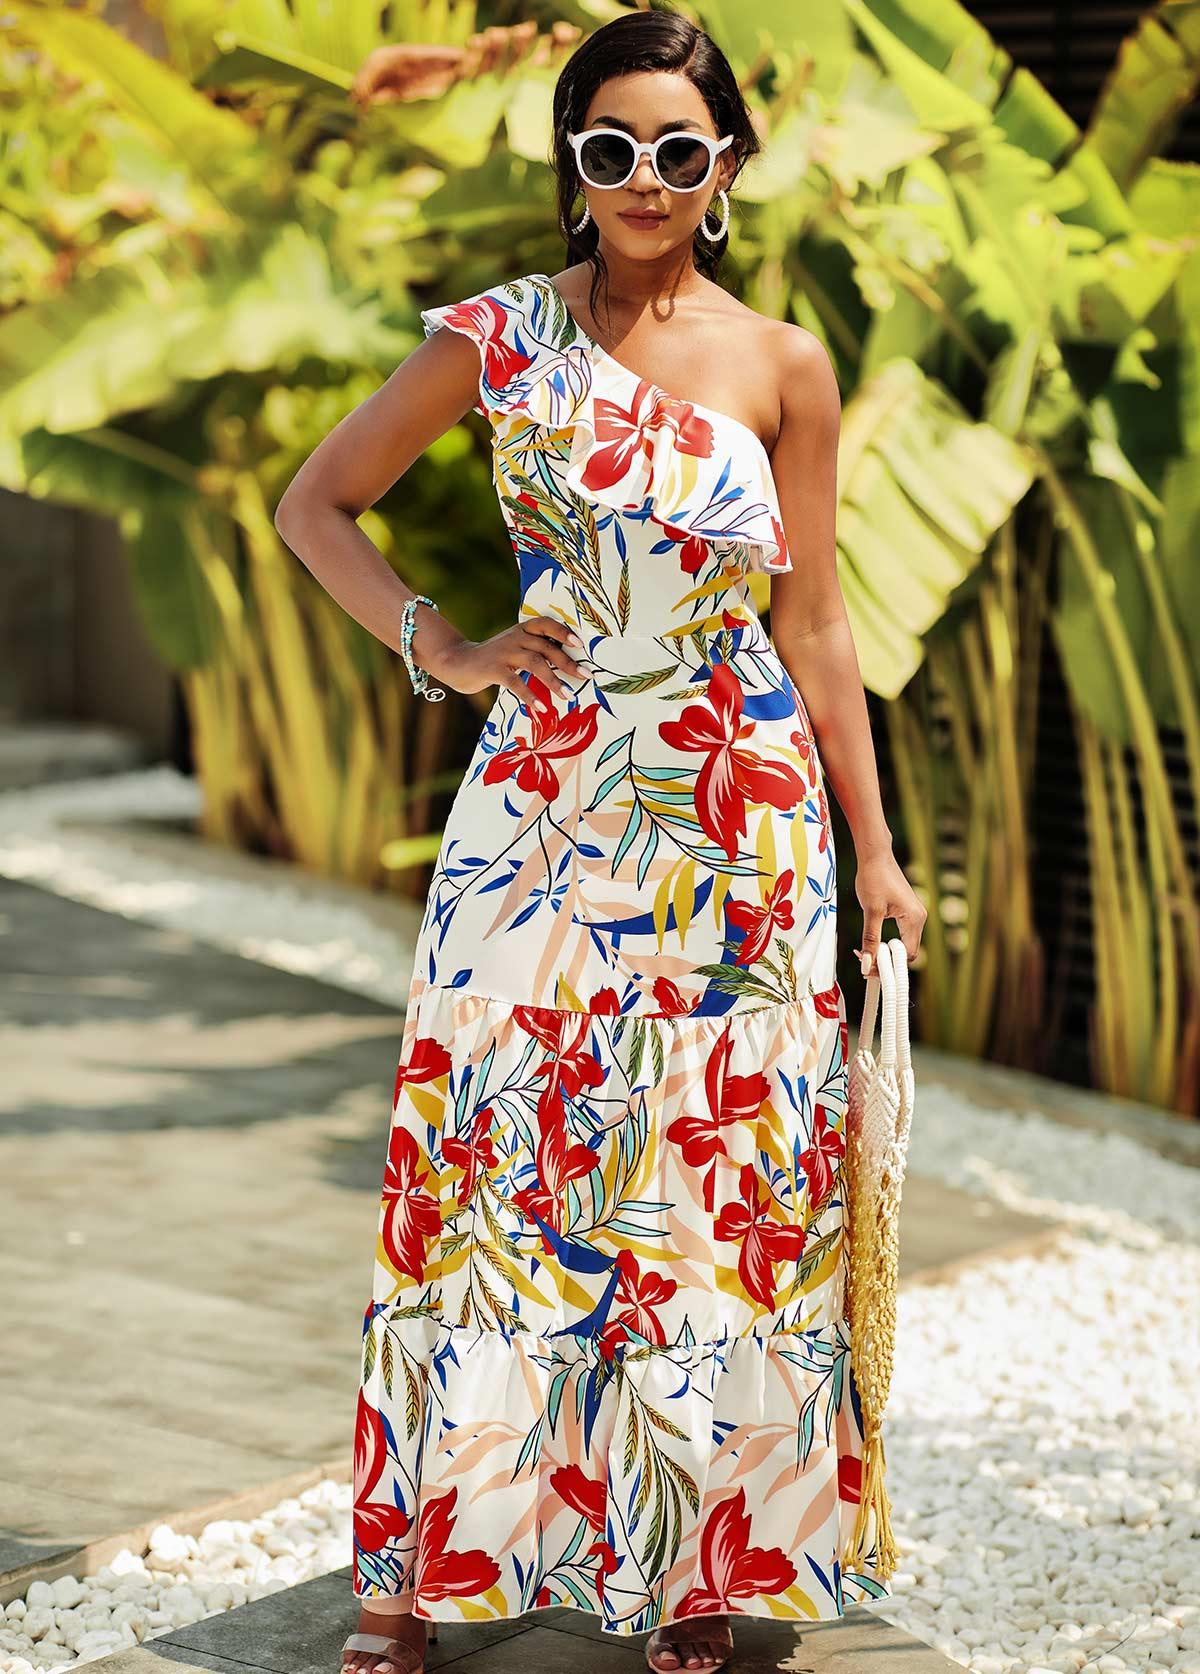 Floral Print One Shoulder Flounce Dress